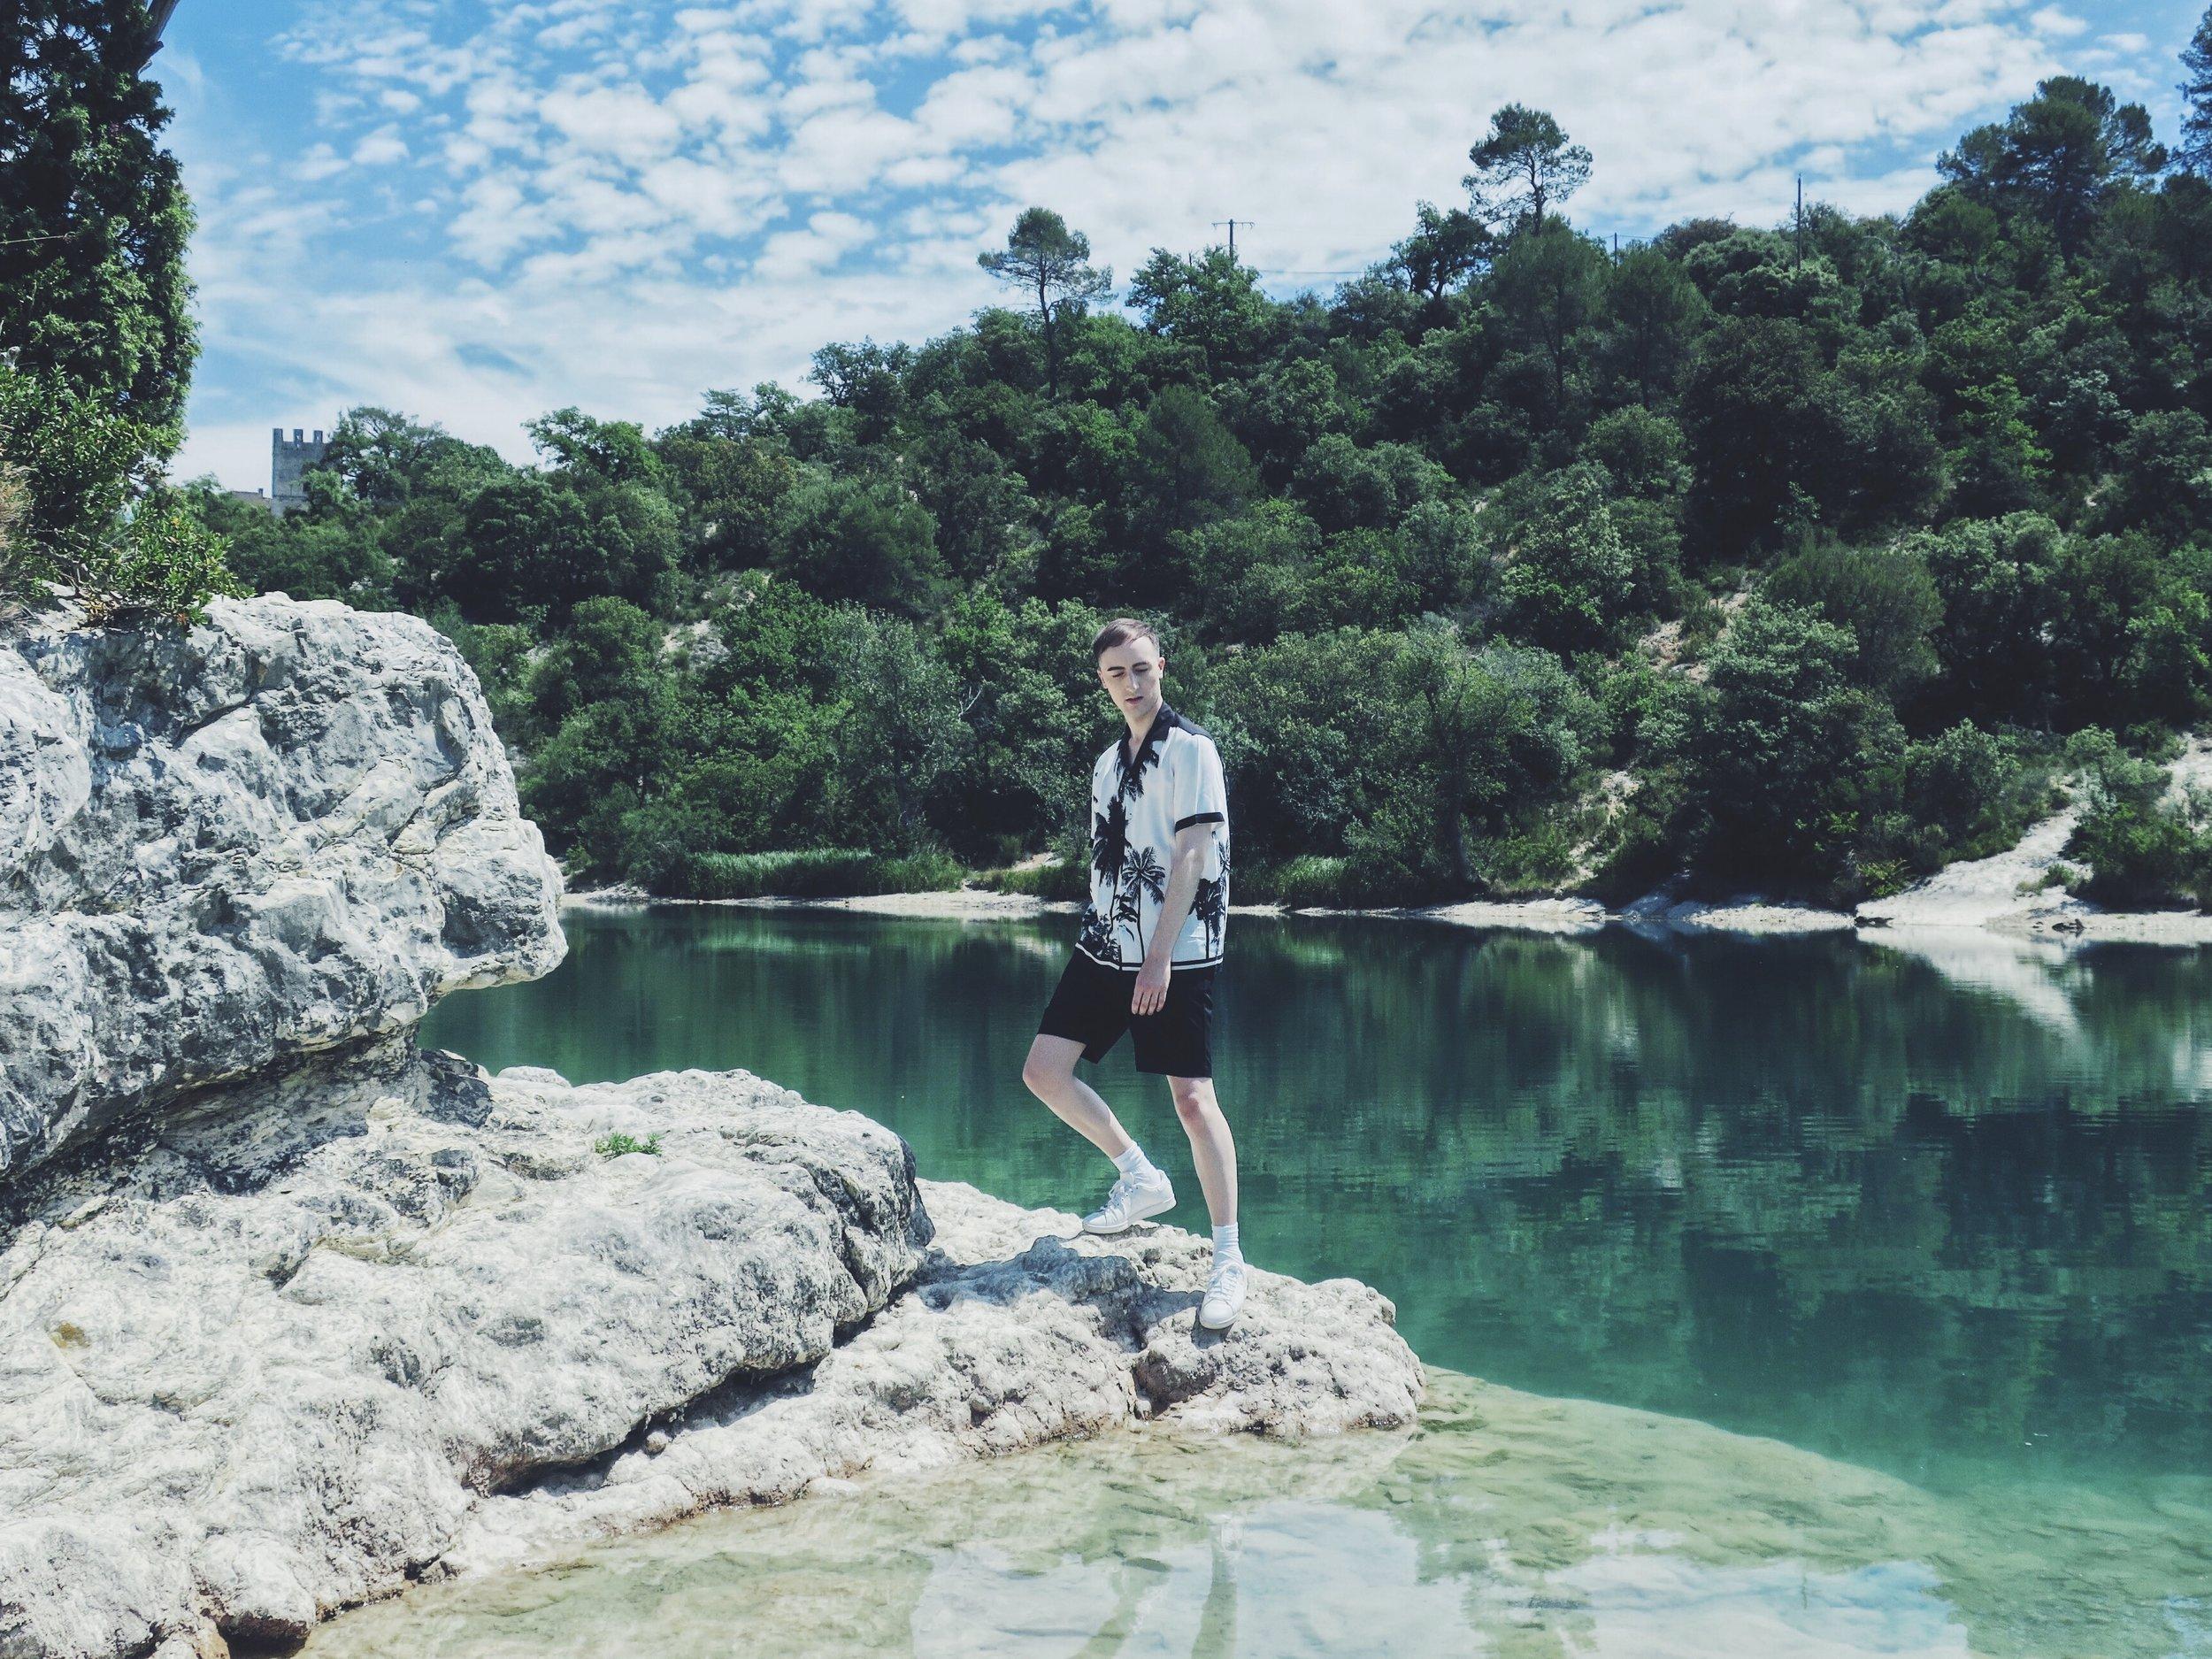 Burton Menswear shirt via Asos.com - Zara shorts - Adidas Stan Smith sneakers